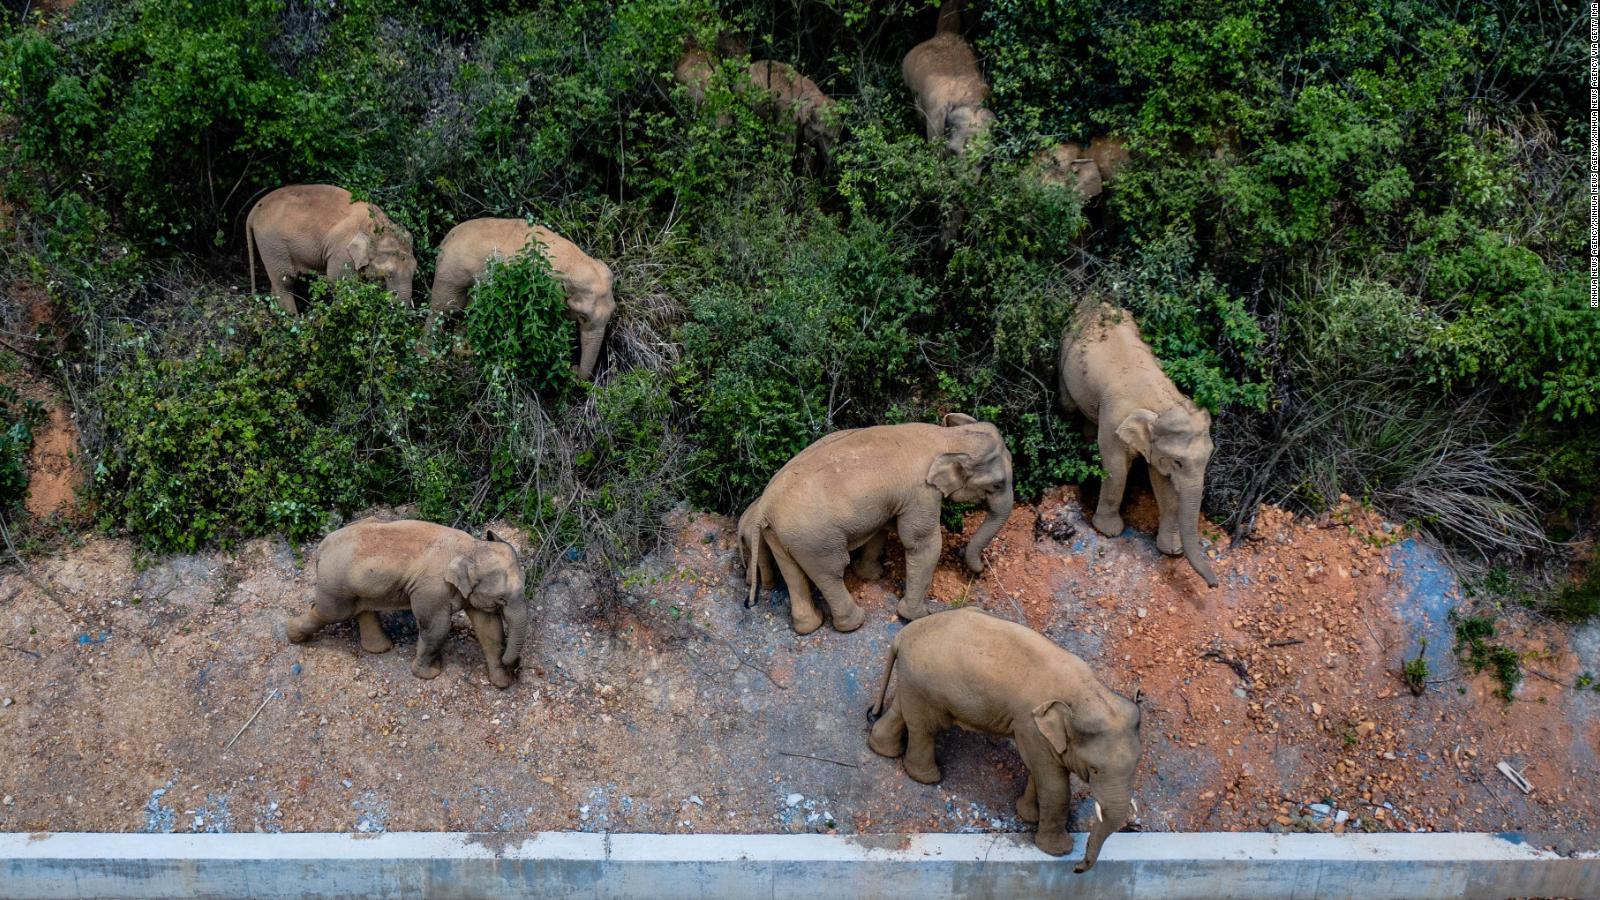 Manada de elefantes deambula por las calles de China